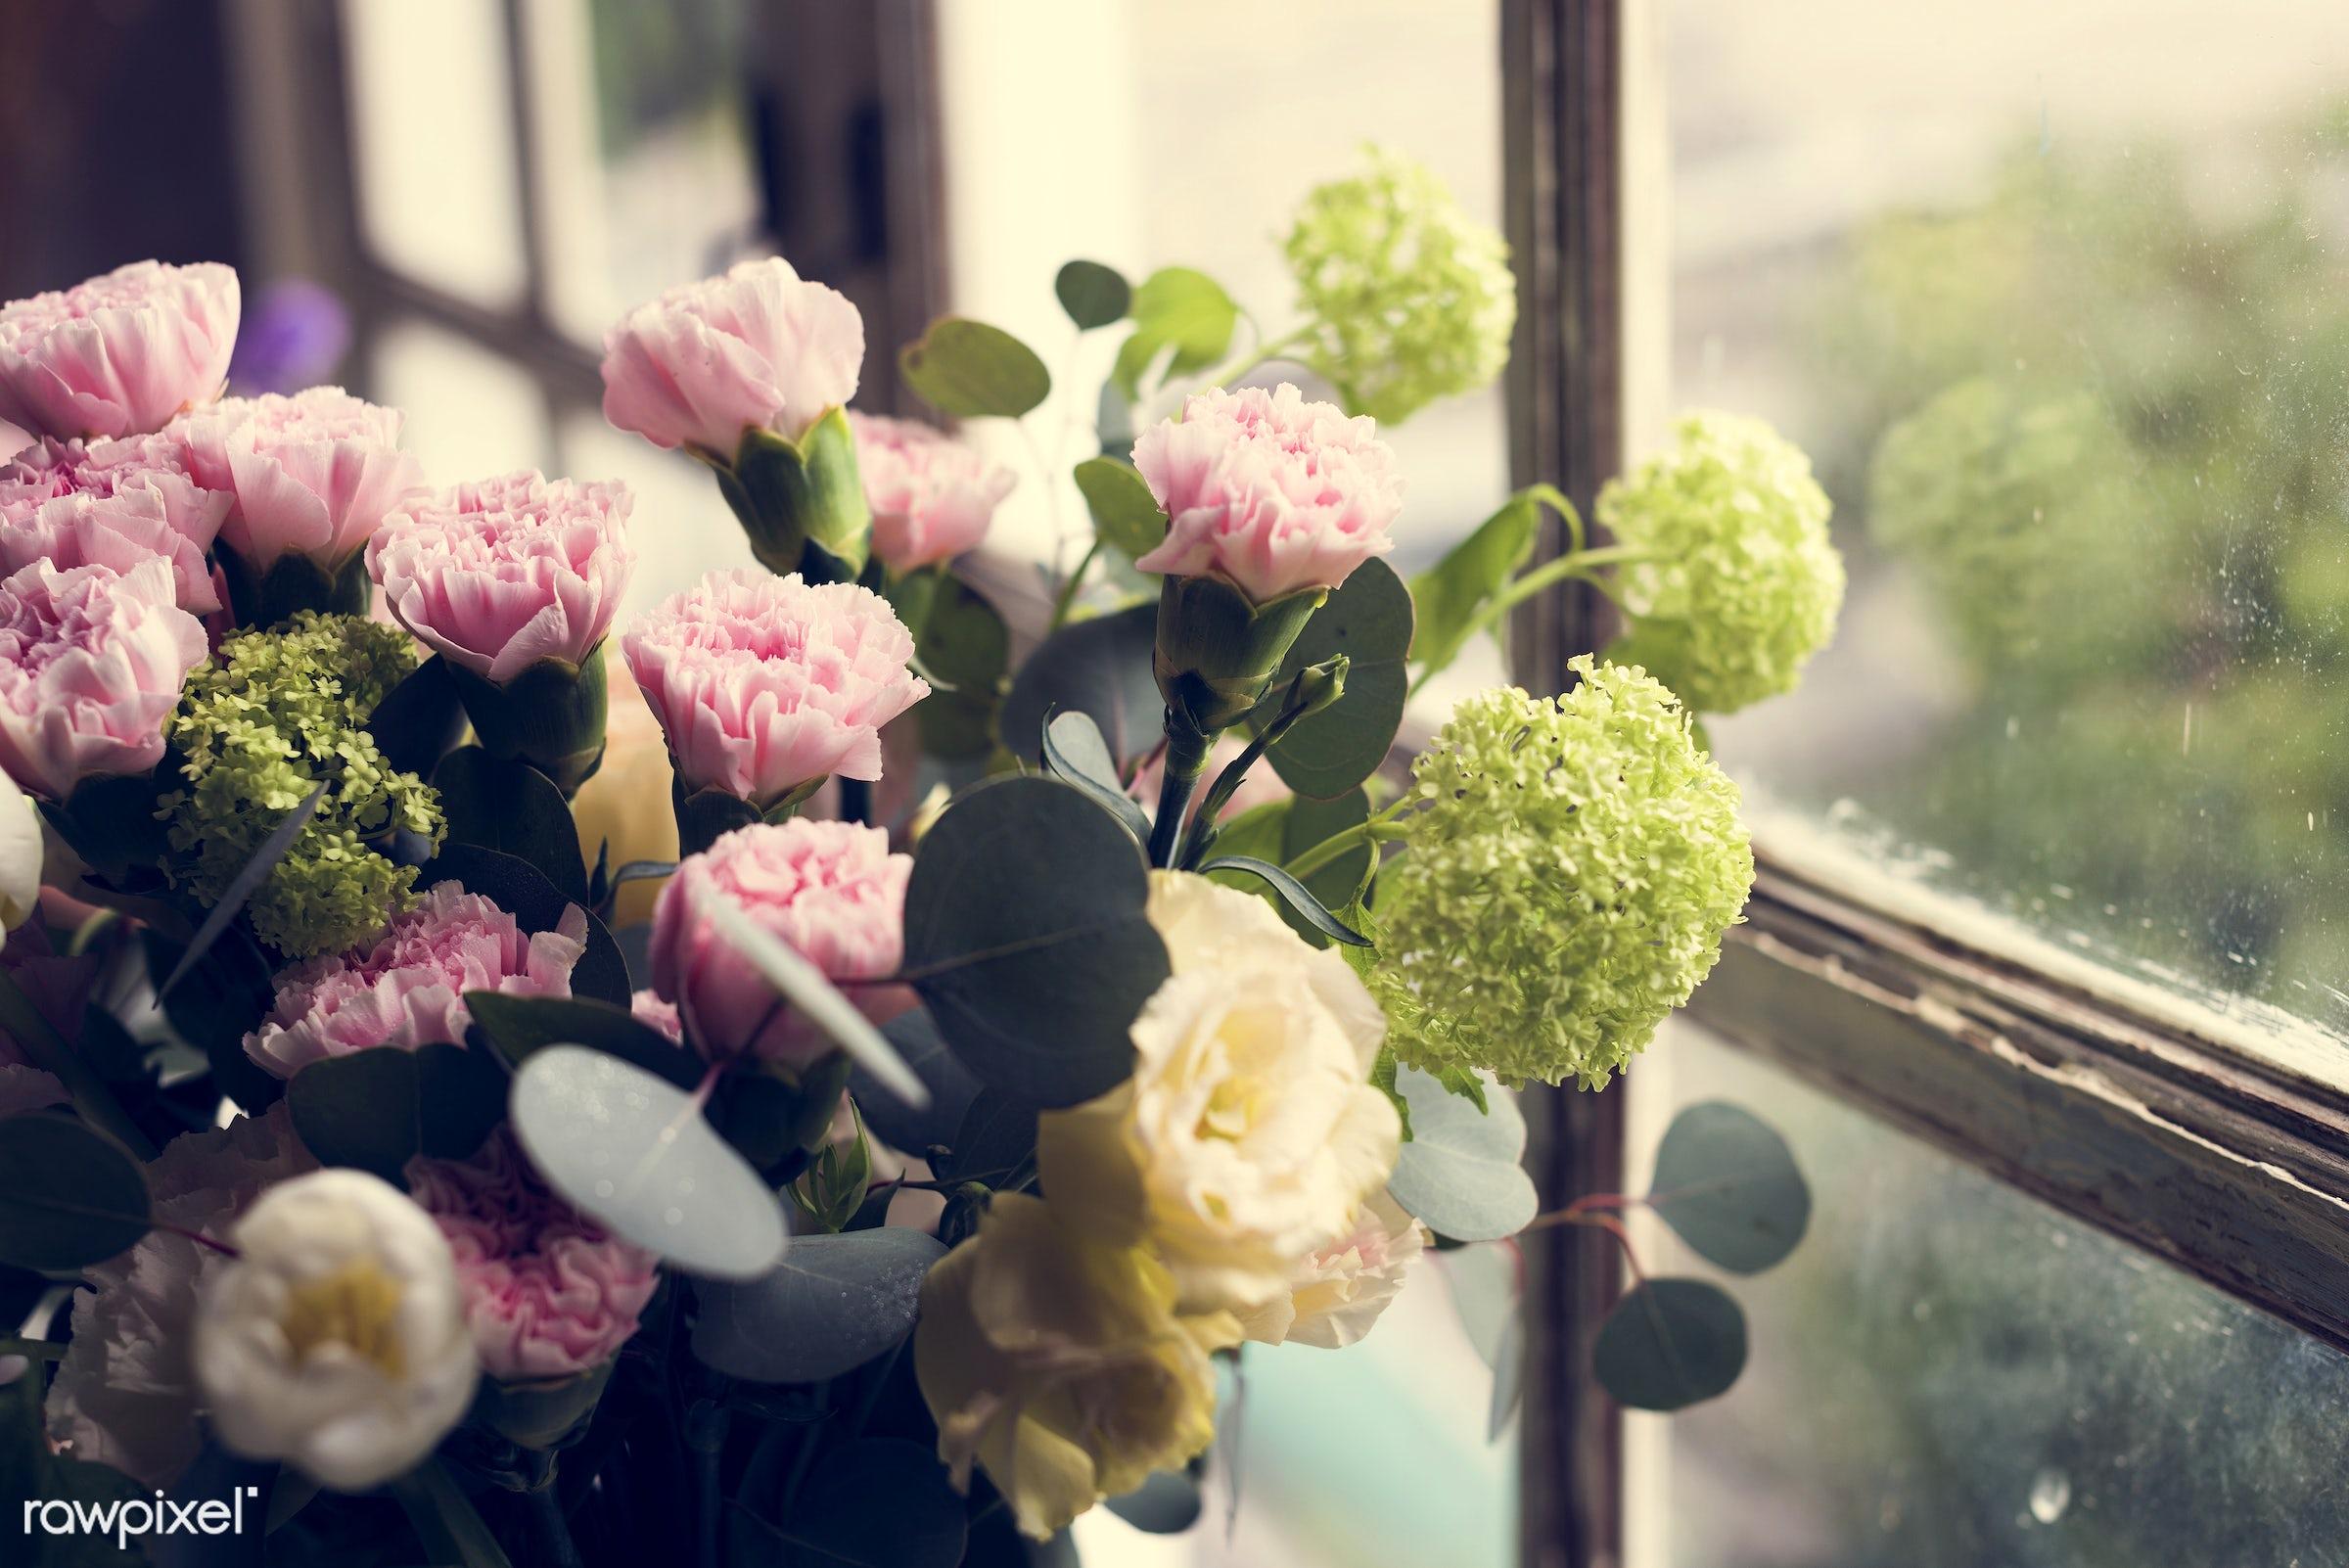 bouquet, craft, aromatic, decorative, beauty, spring, rustic, blossom, nature, style, vintage, decoration, flora, art,...